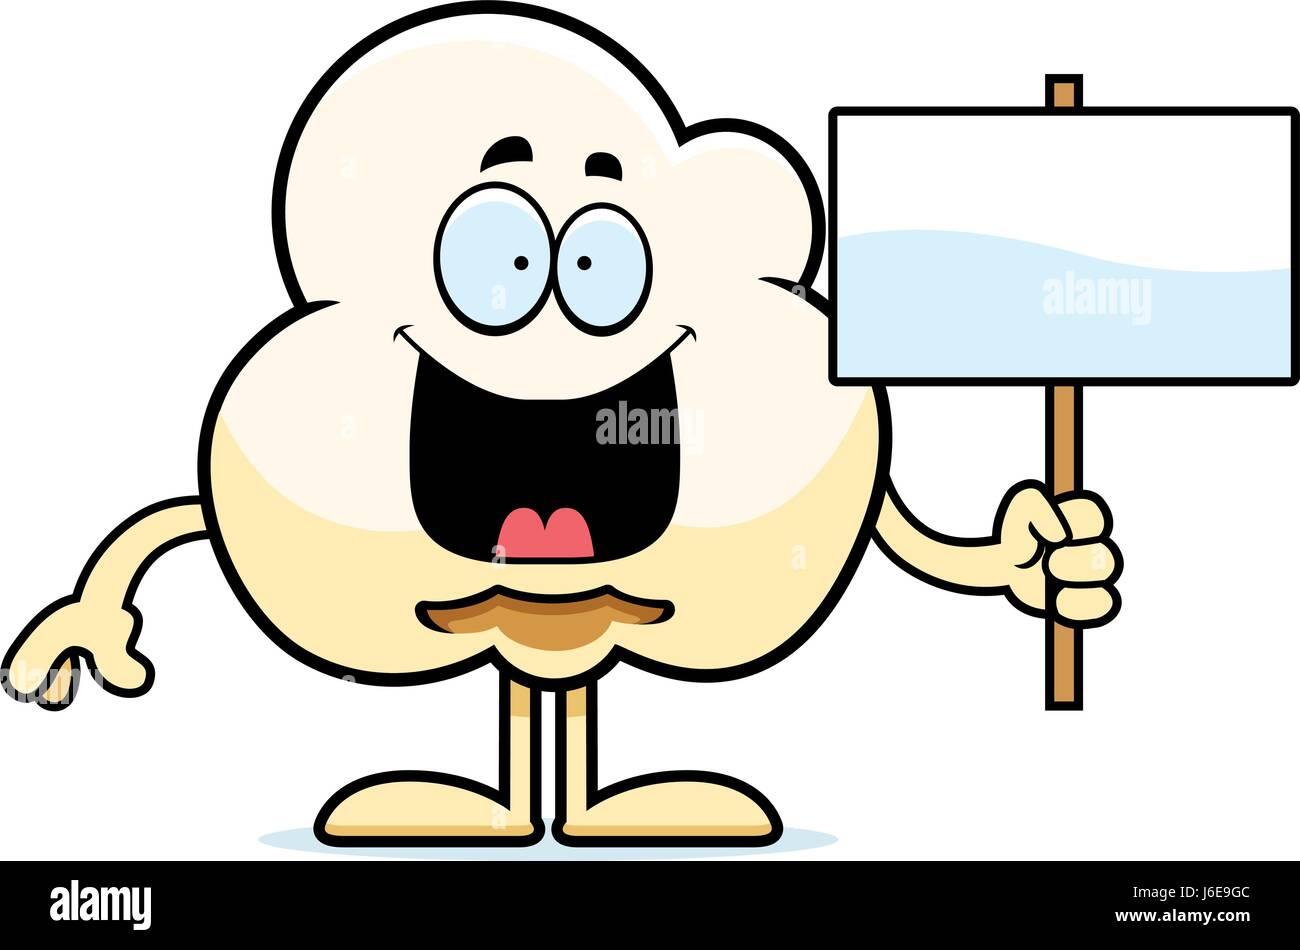 a cartoon illustration of a popcorn kernel holding a sign stock rh alamy com popcorn kernel clipart black and white popcorn kernel clip art free